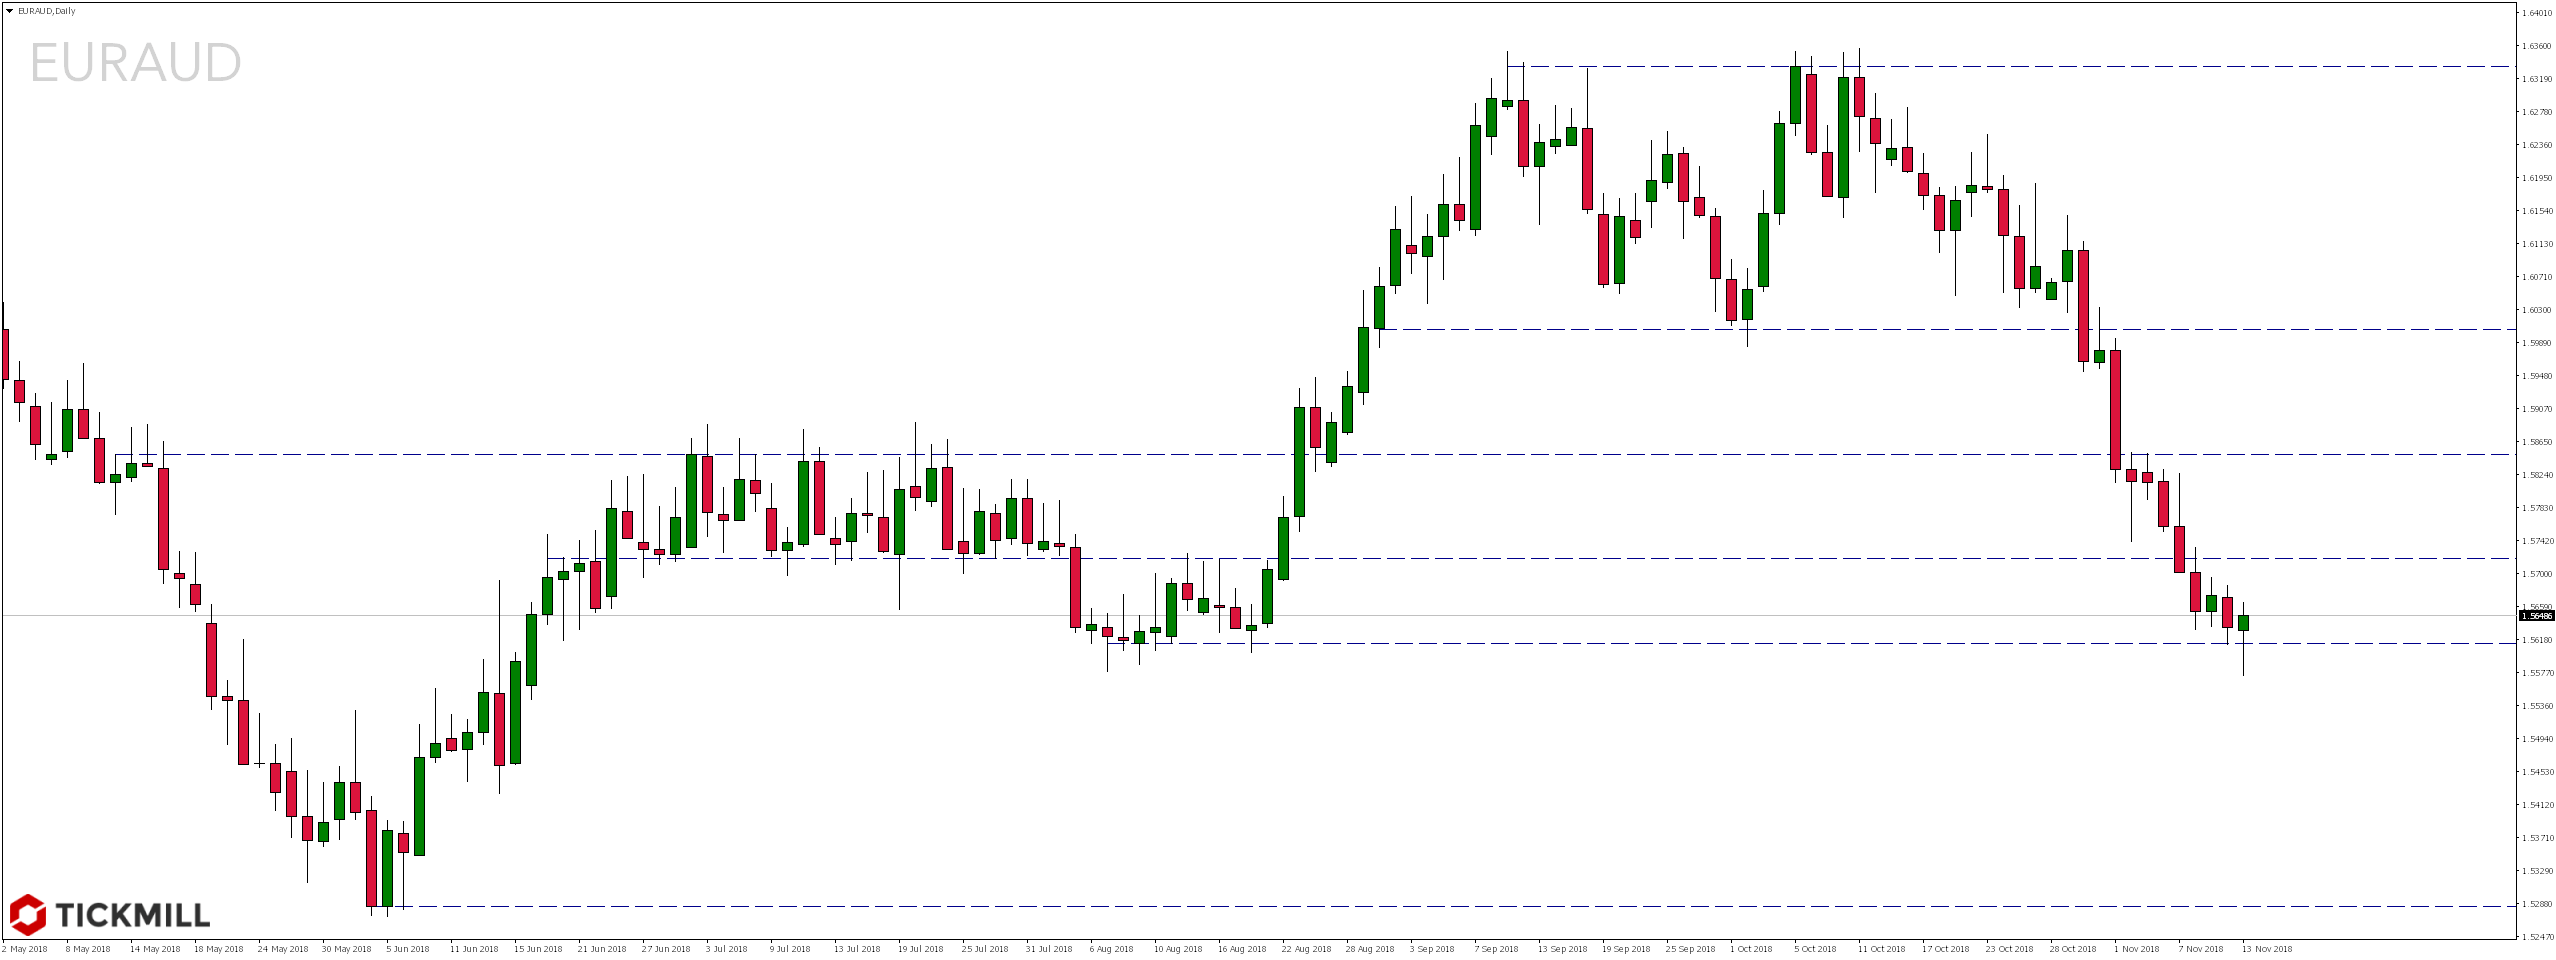 Notowania pary walutowej EURAUD